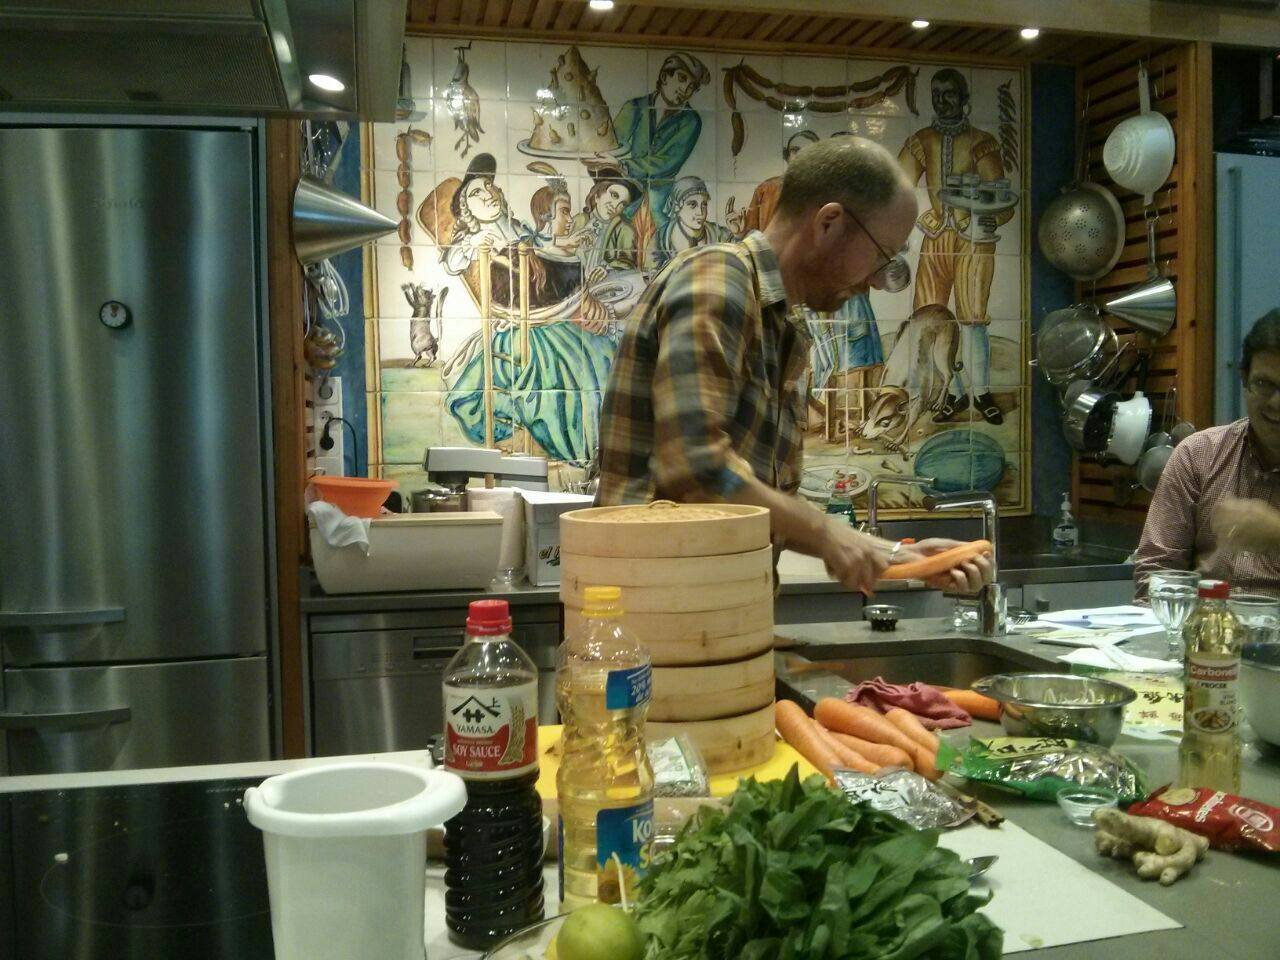 Matthew Scott clases de cocina de New Orleans en Alambique - Gumbo Madrid